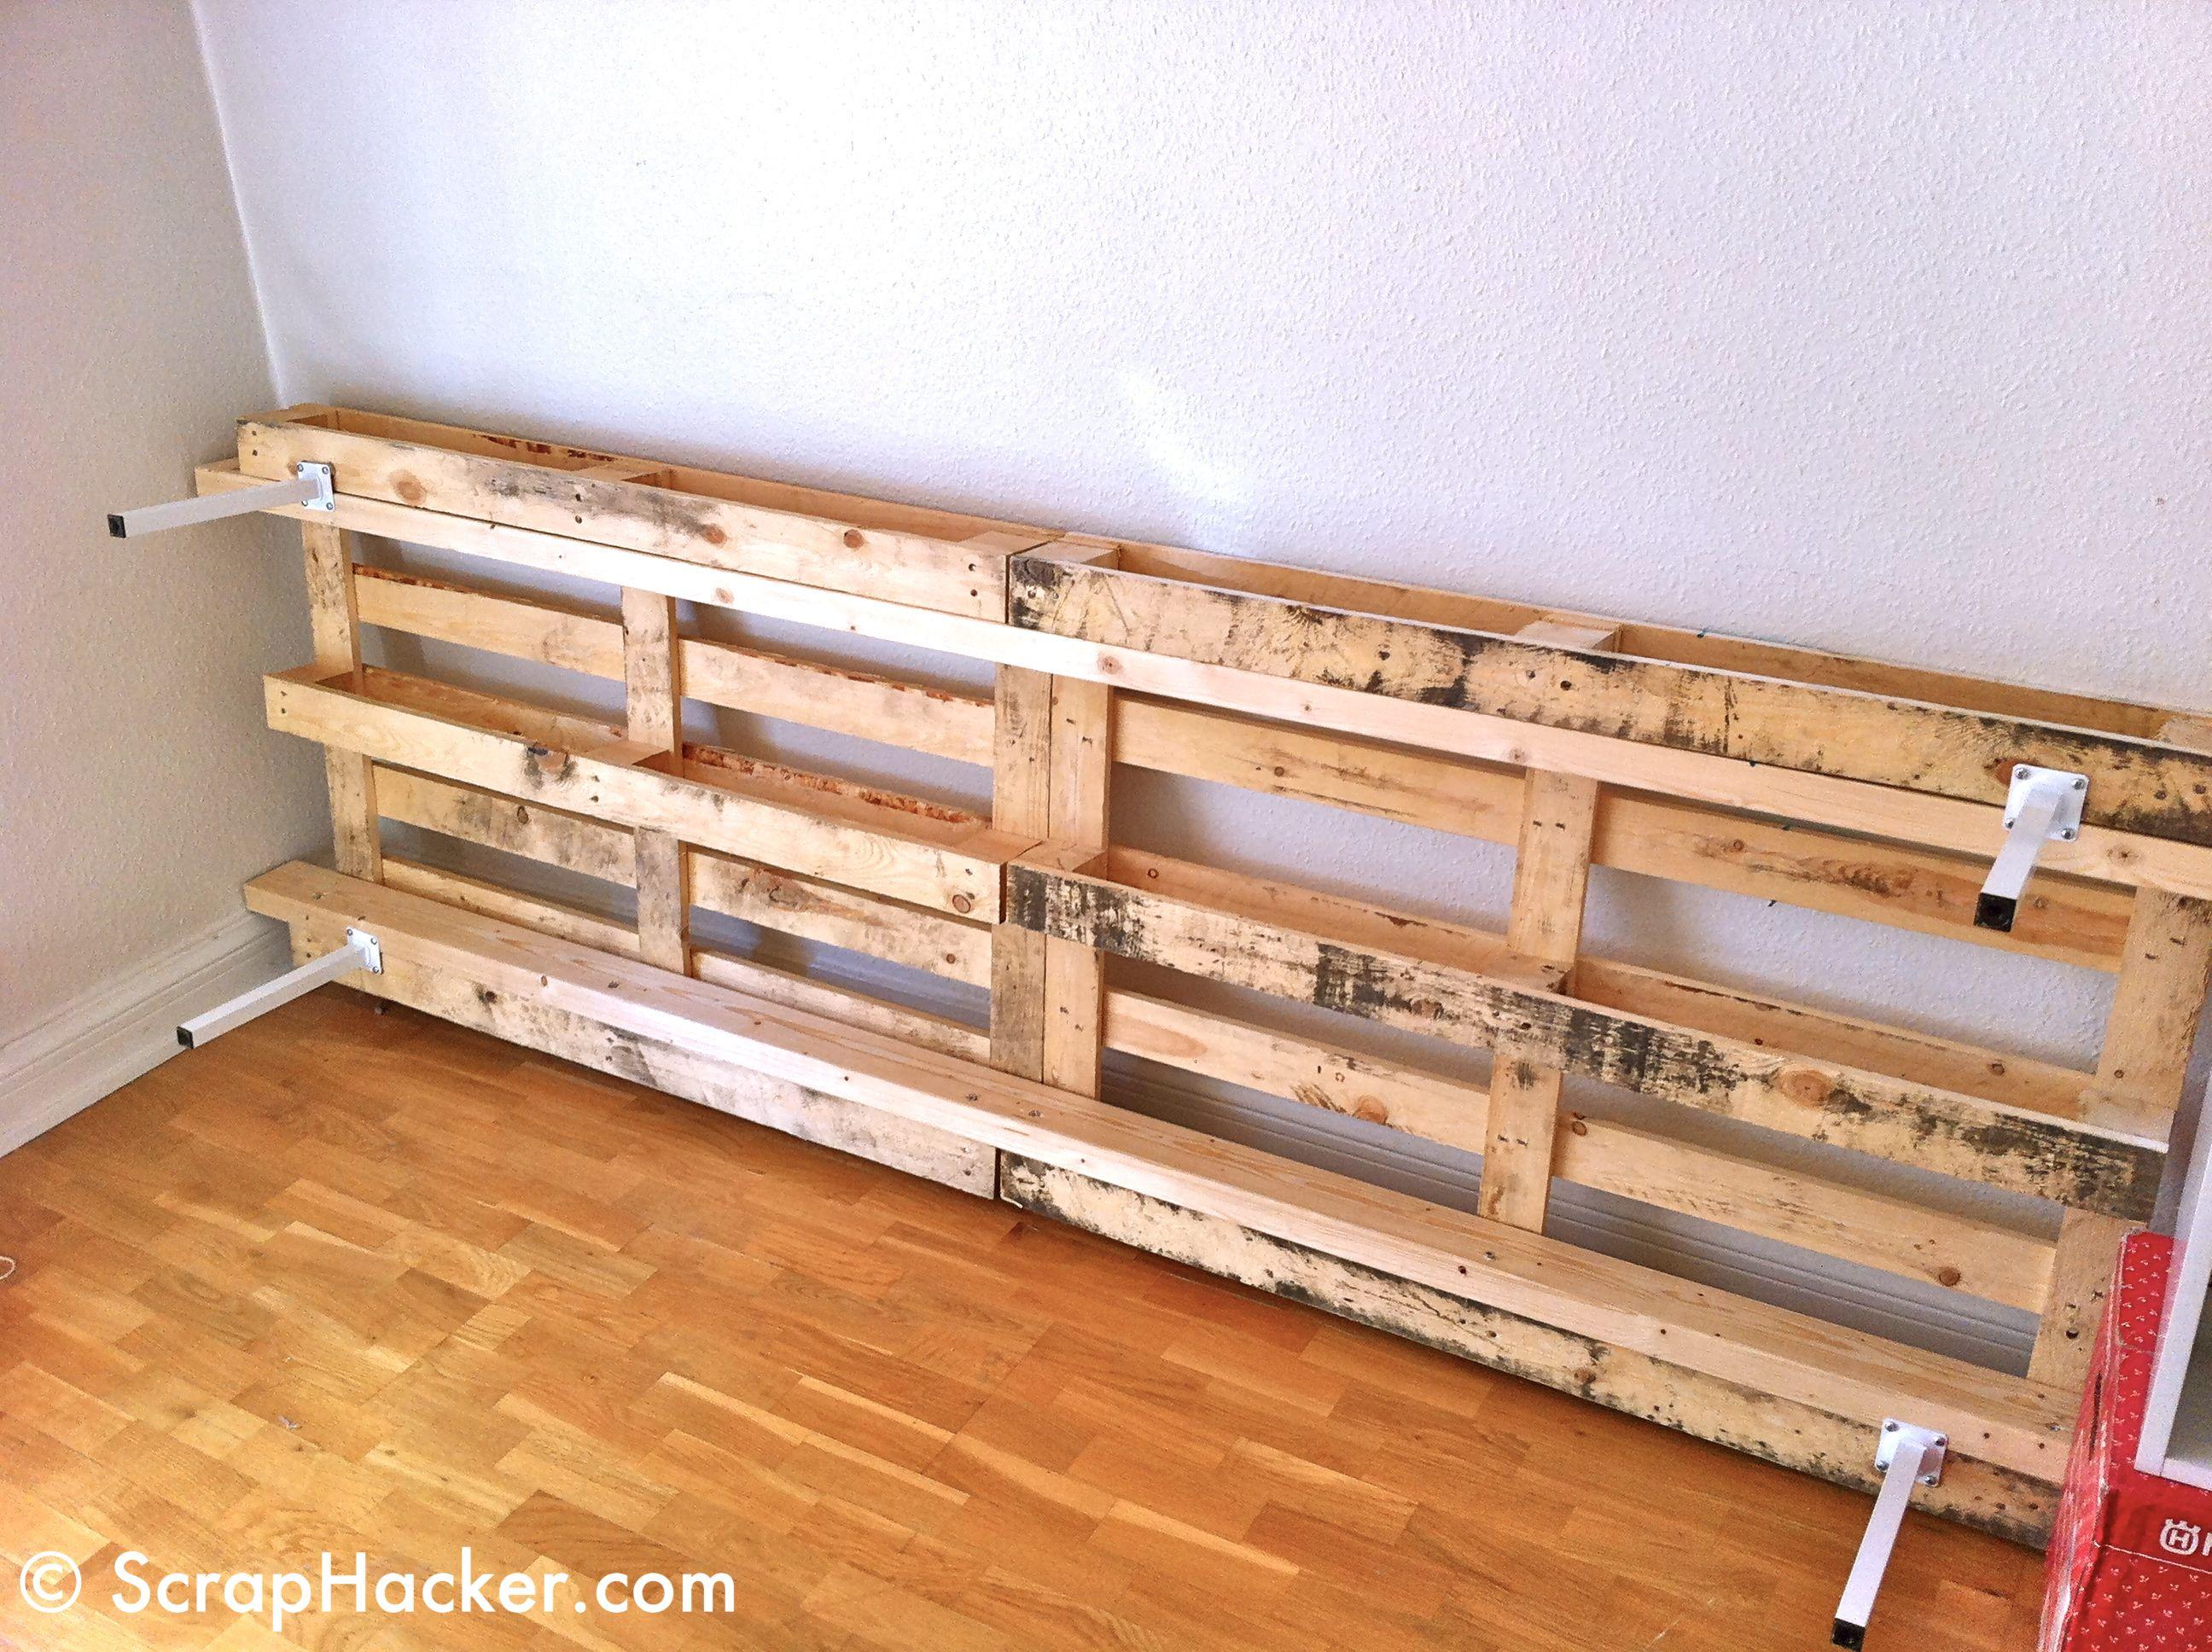 Diy Platform Couch Google Search Decorating Ideas Pinterest - Como-hacer-un-sofa-con-palets-de-madera